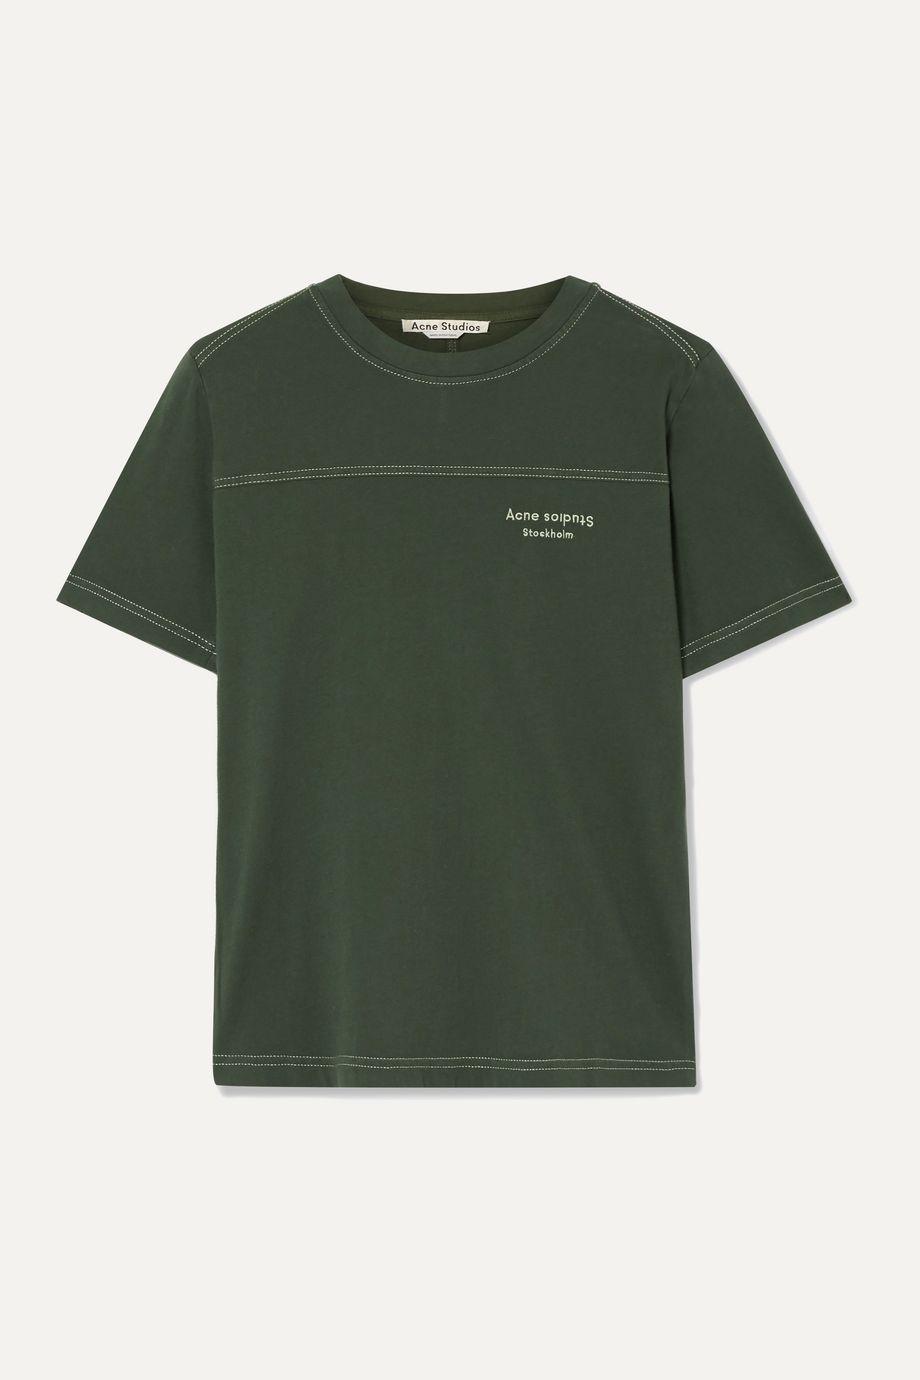 Acne Studios Ewanda embroidered cotton-jersey T-shirt